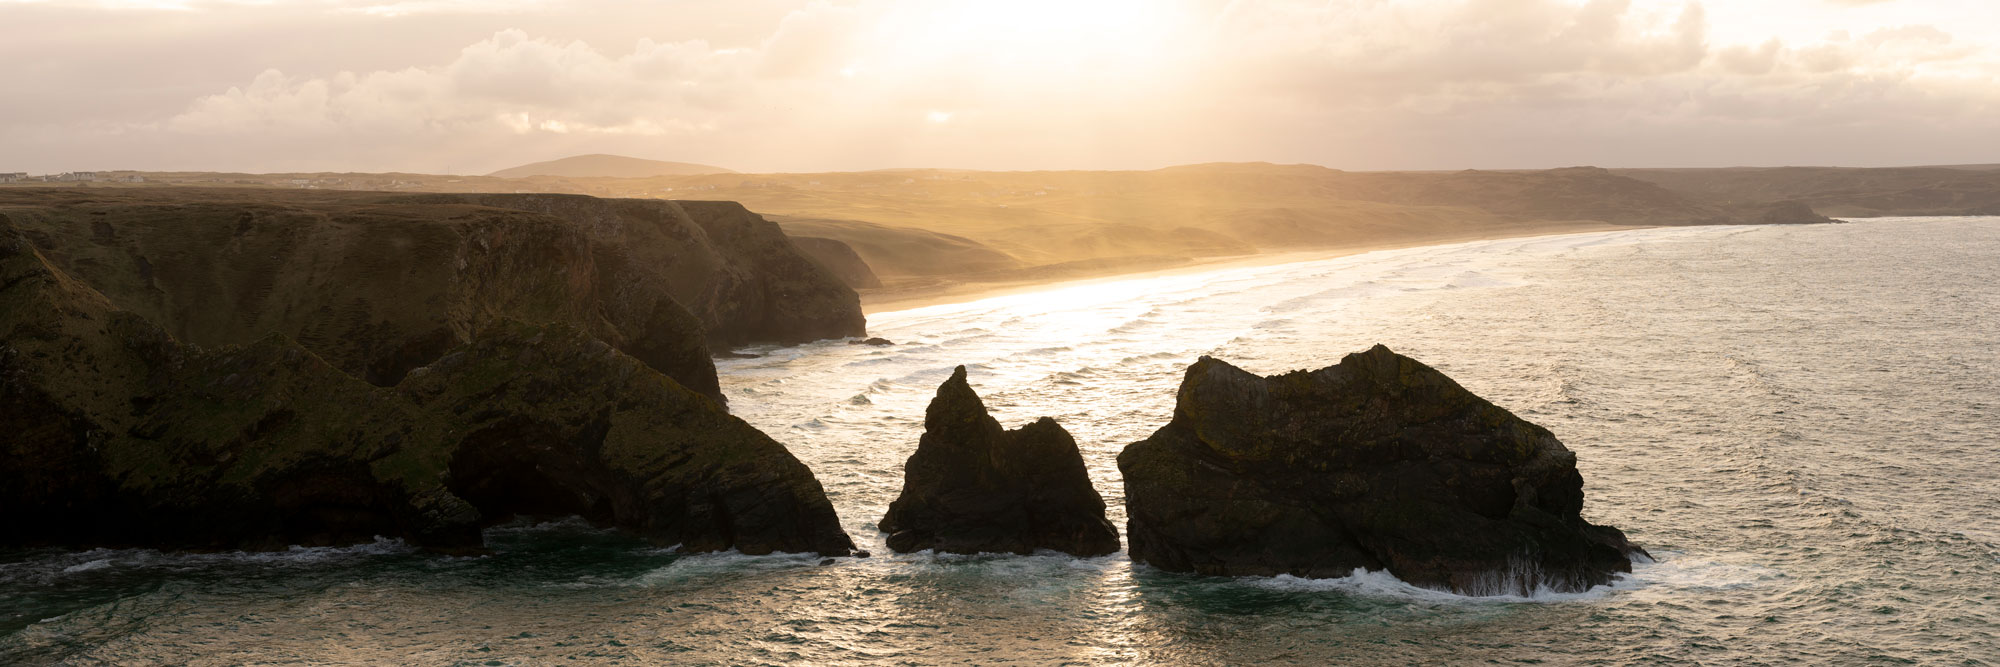 Tolsta head rocky coast Scotland